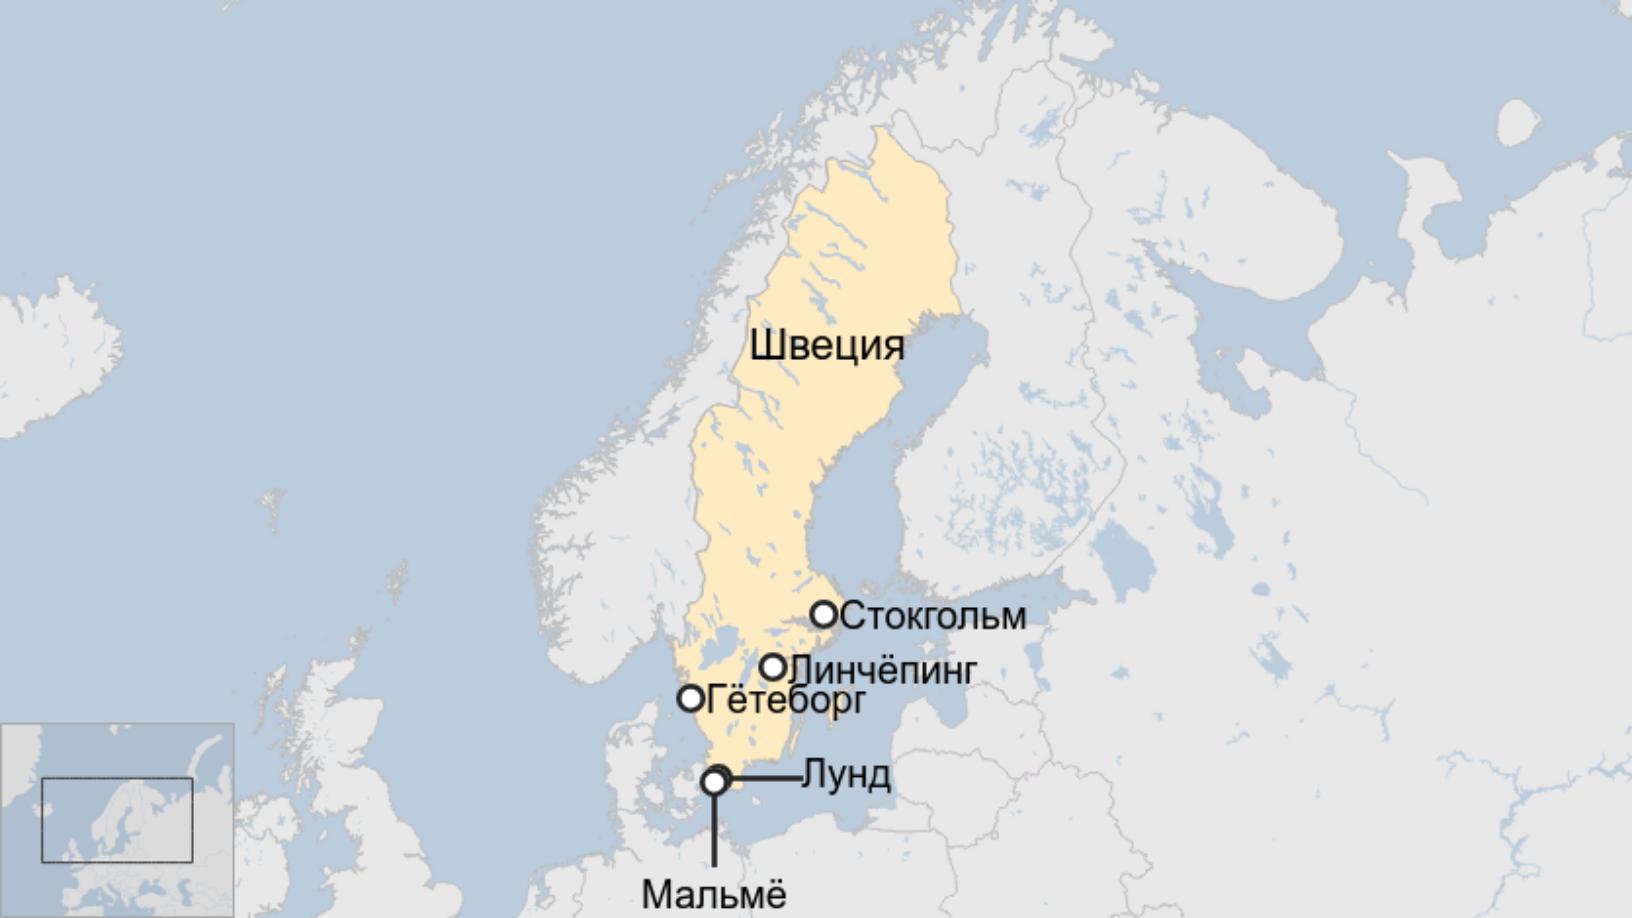 Map: Швеция